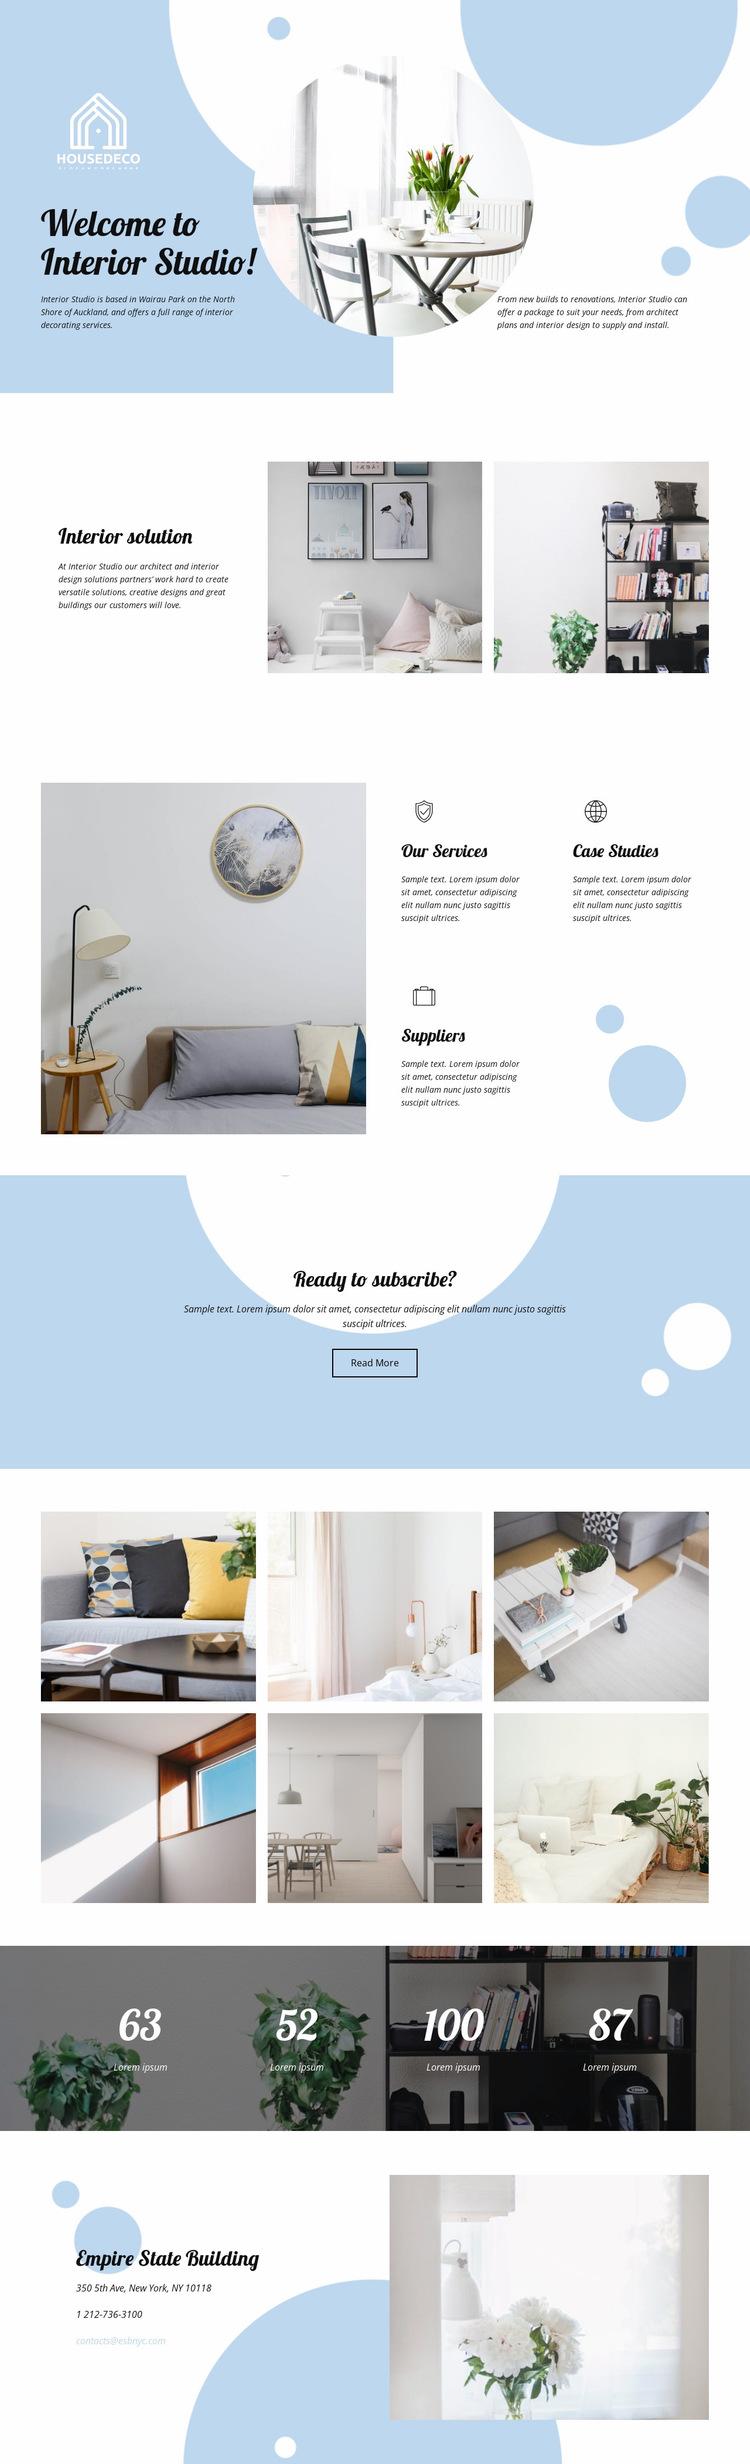 Interior Studio Website Builder